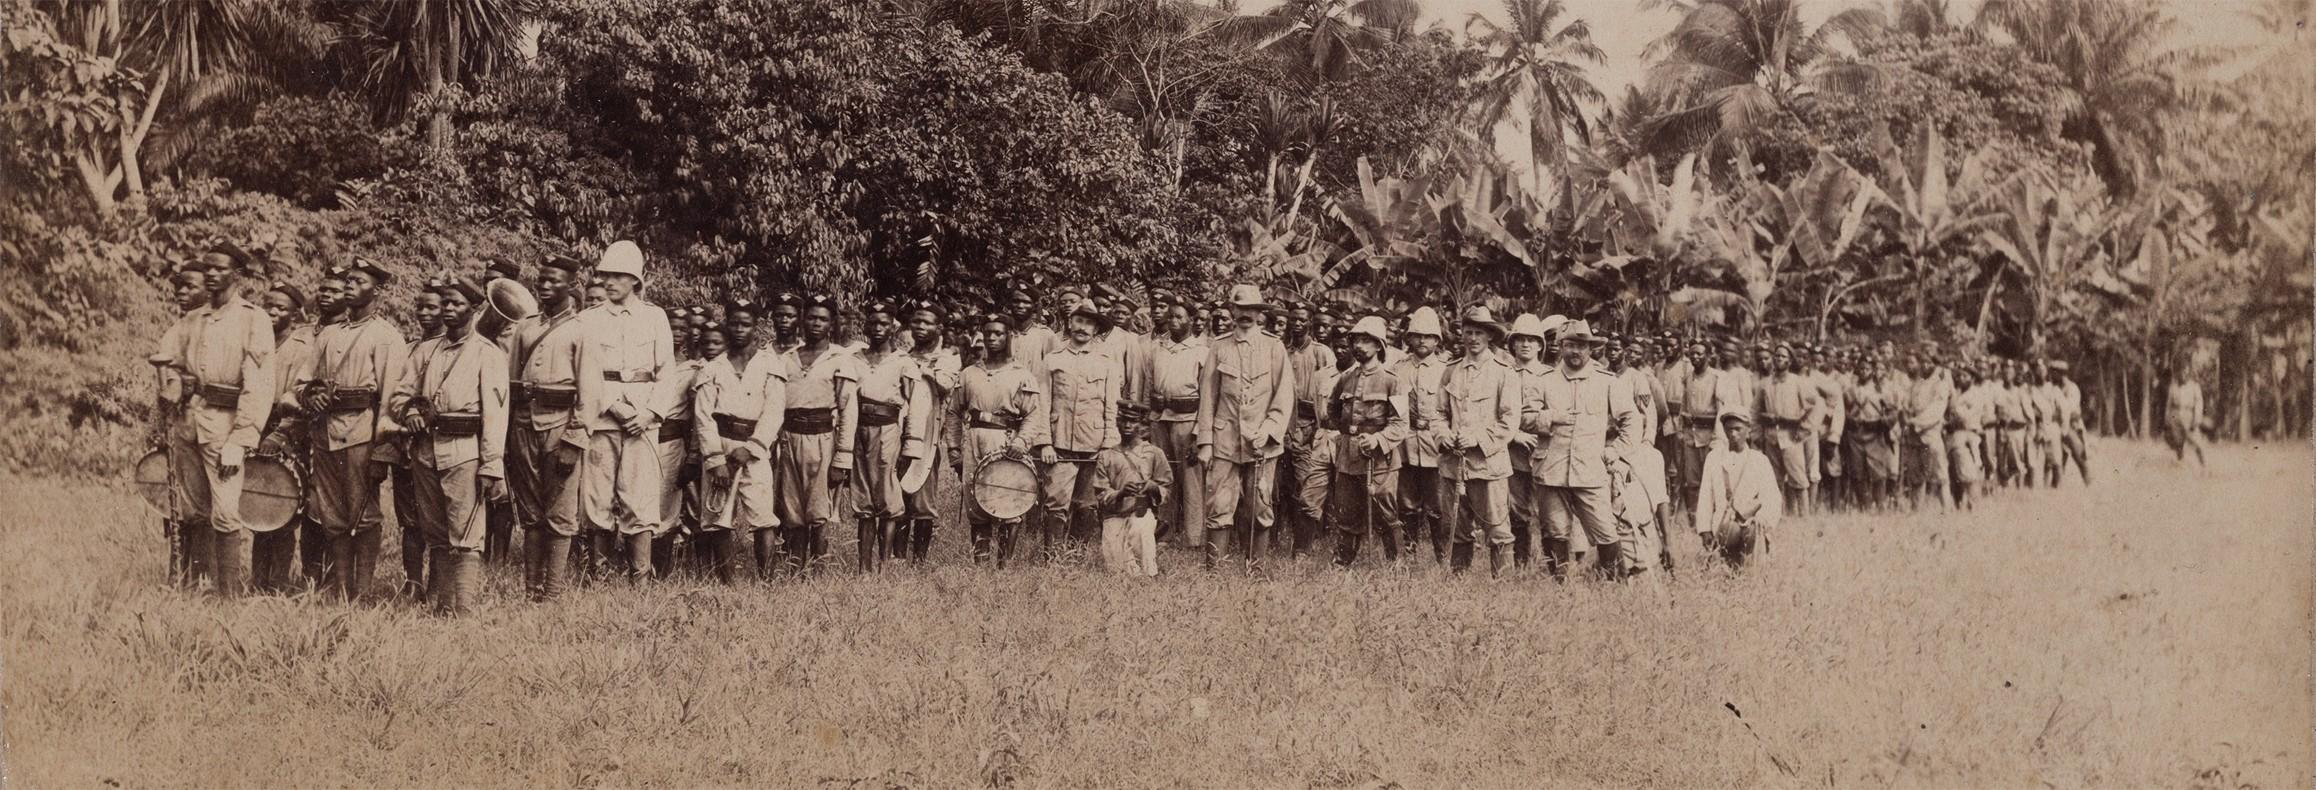 Members of the 'Deutsche Schutztruppe' in Cameroon exercising, photograph, 1900 (Wegemuseum Wusterhausen, CC BY-NC-SA)